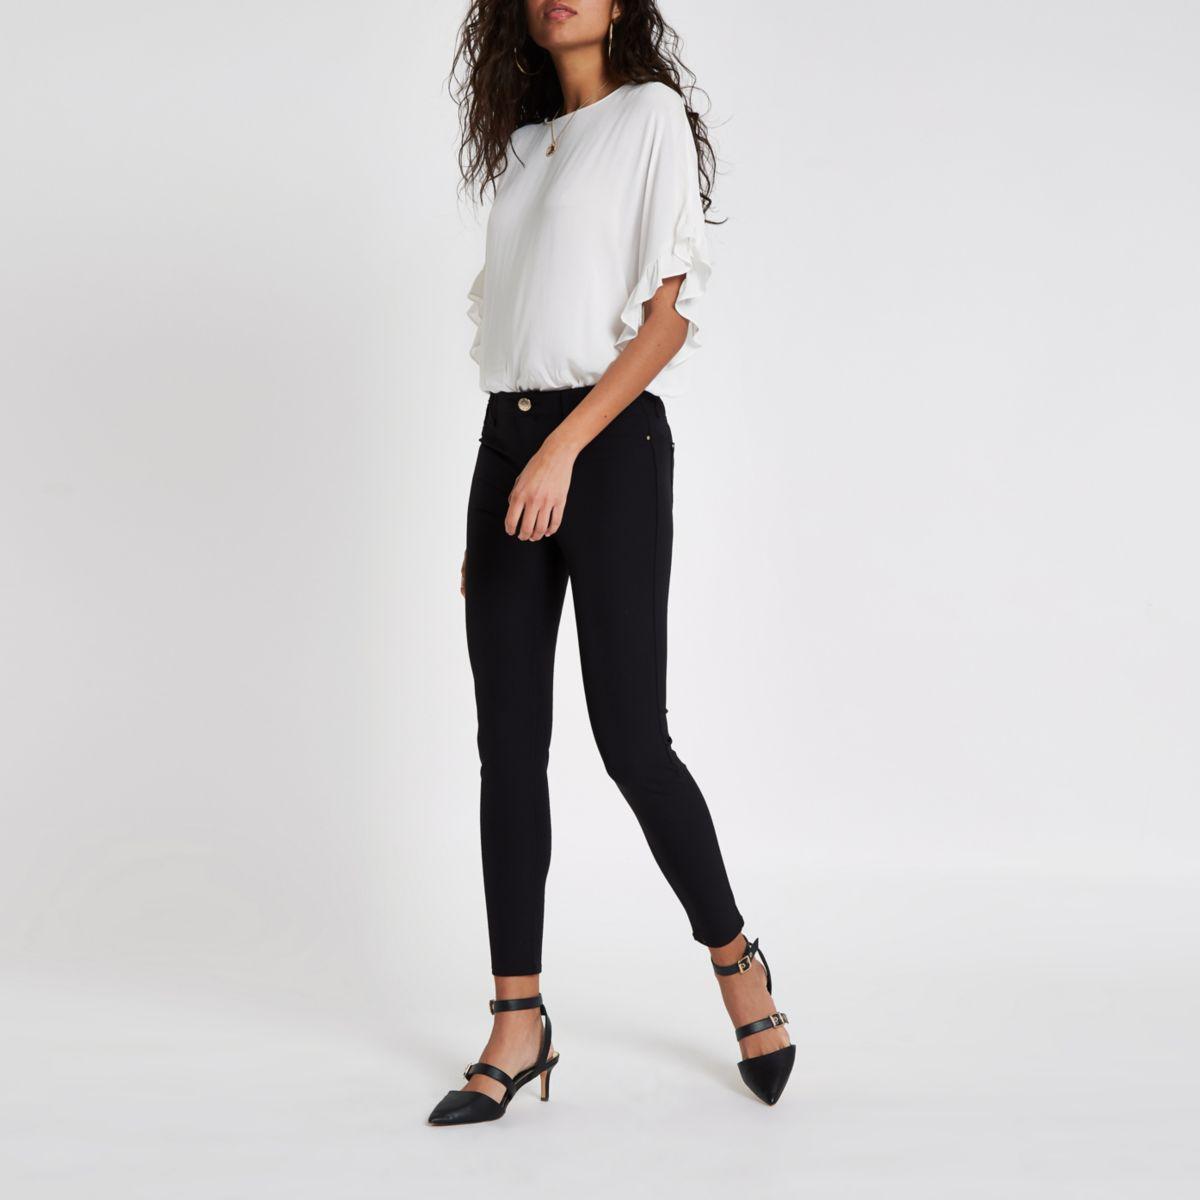 Black high waisted stretch pants